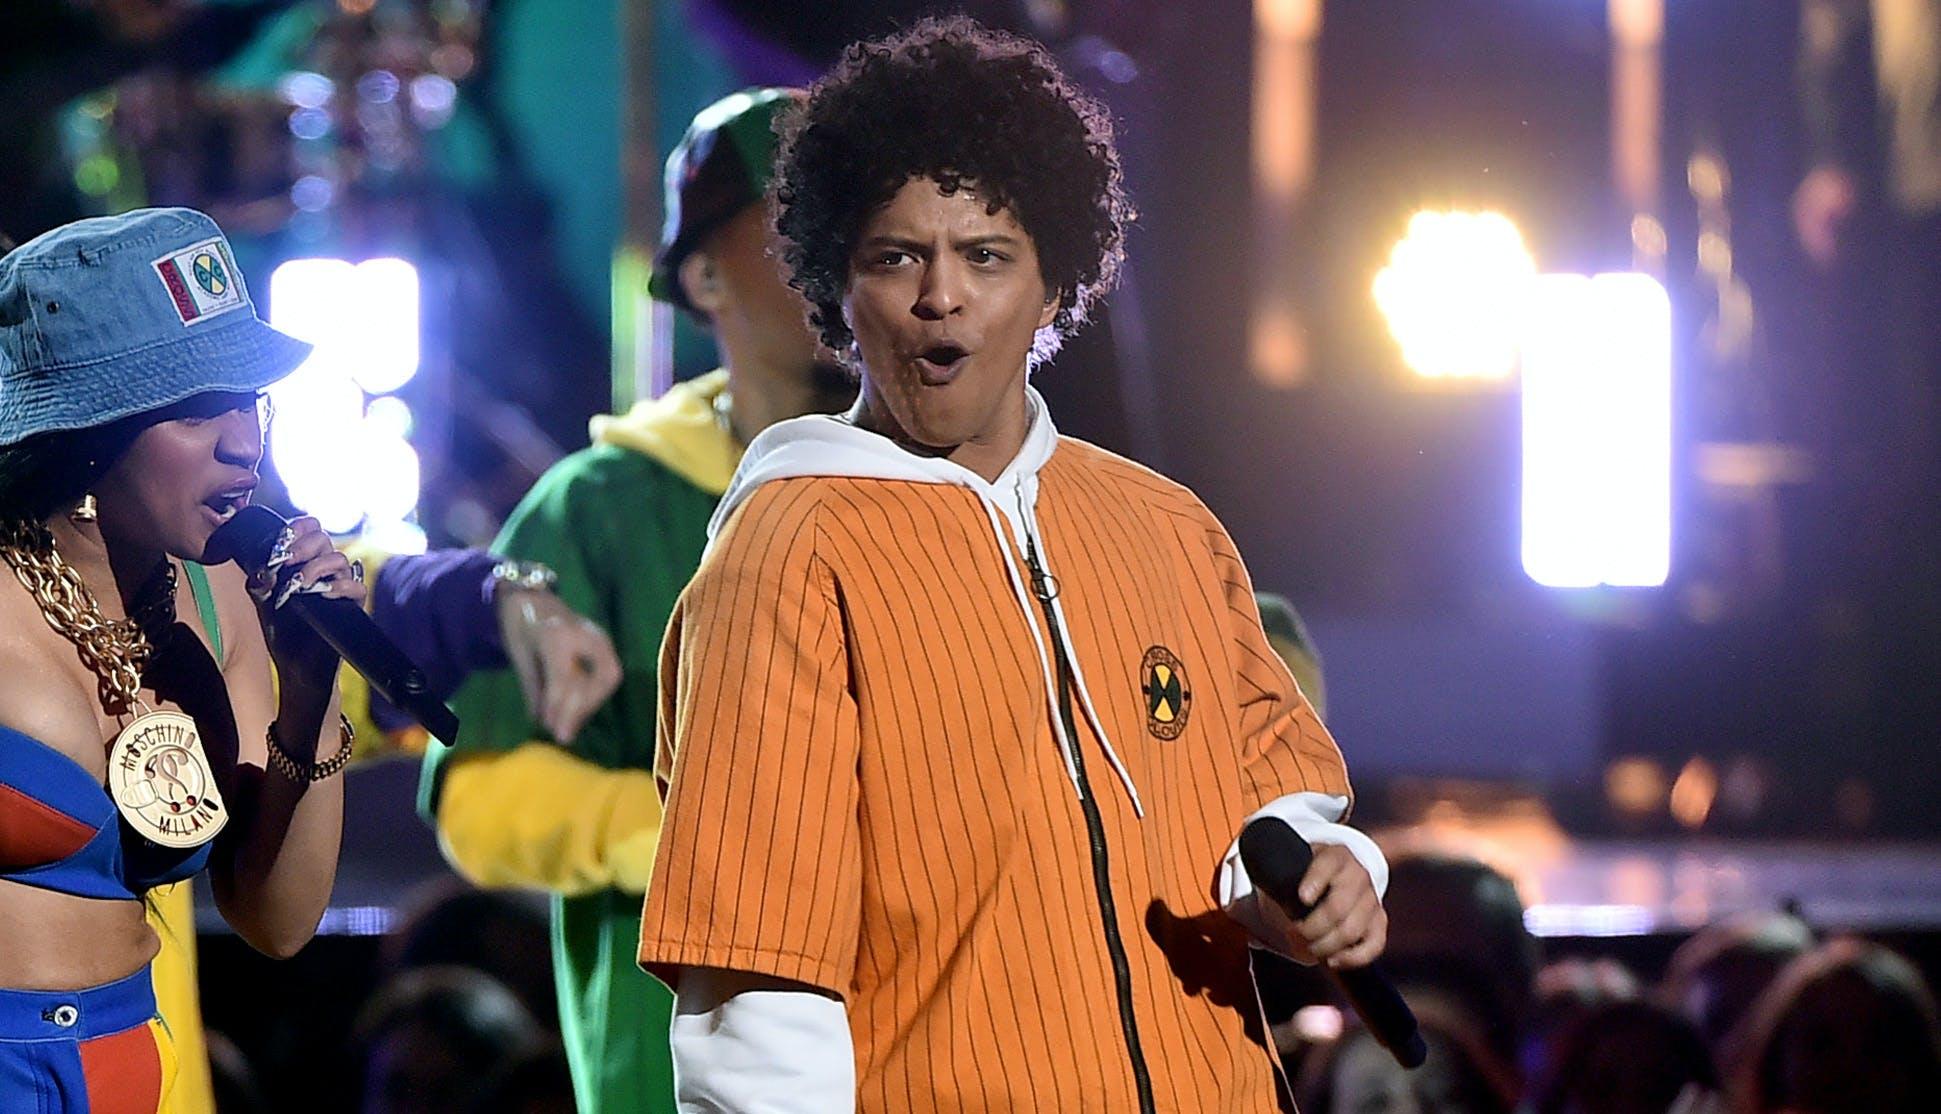 Bruno mars grammy awards